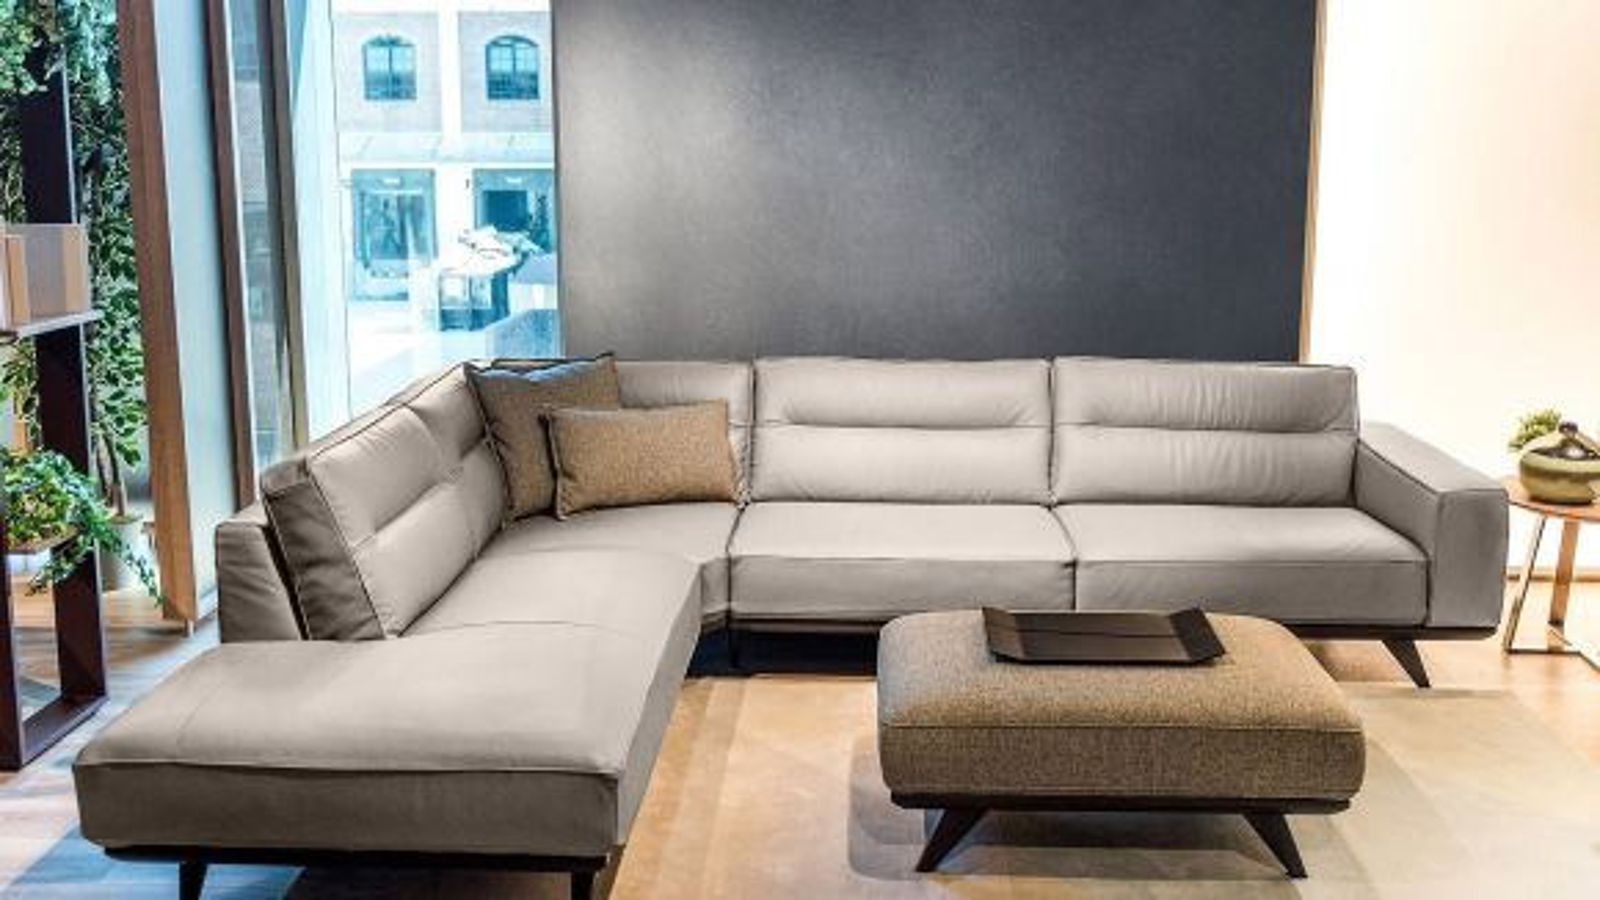 Canapea cu sezlong stanga Adrenalina textil culoarea Tortora